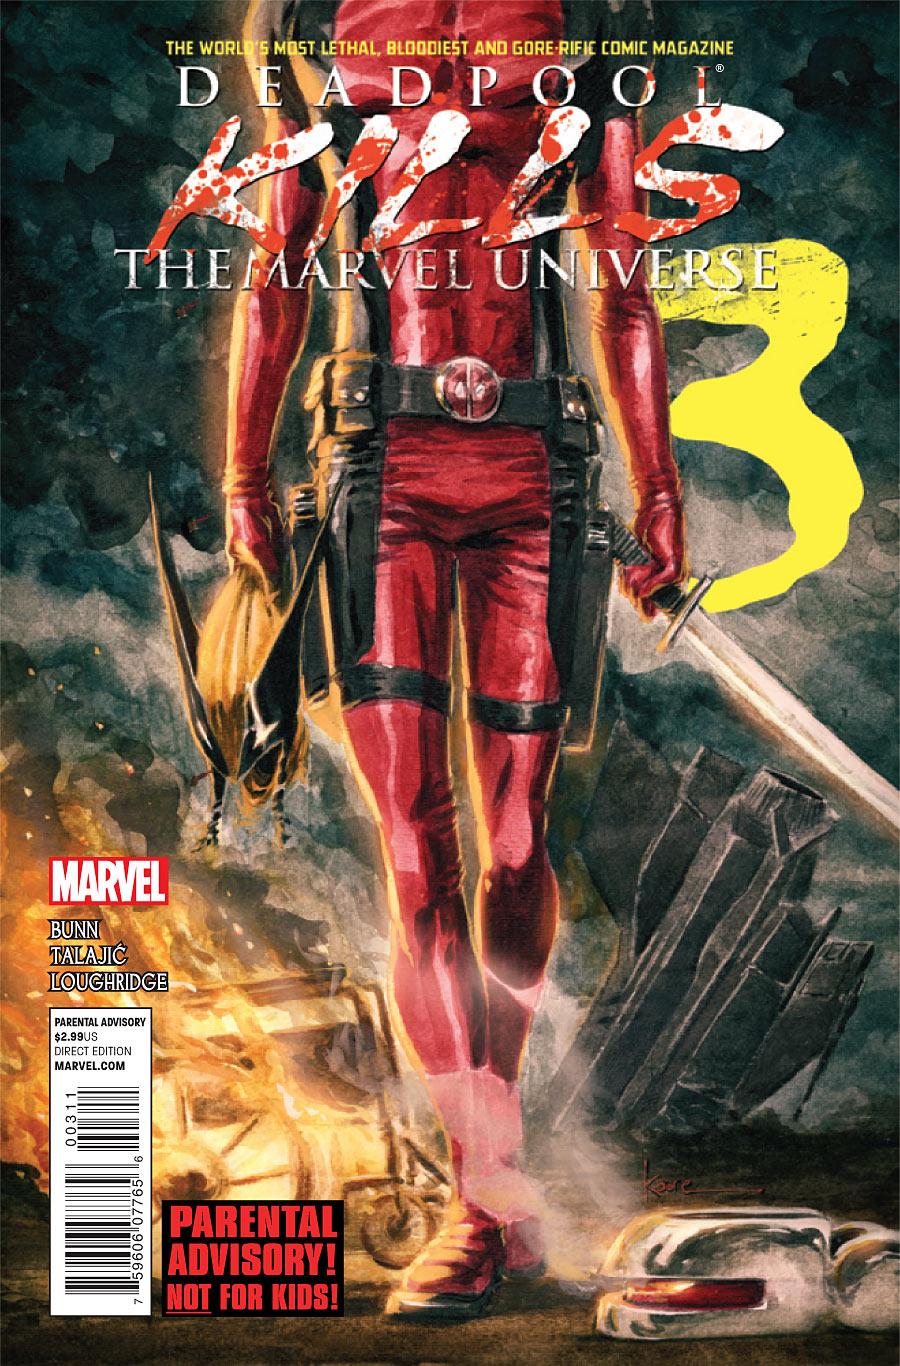 Deadpool Kills the Marvel Universe Vol 1 3